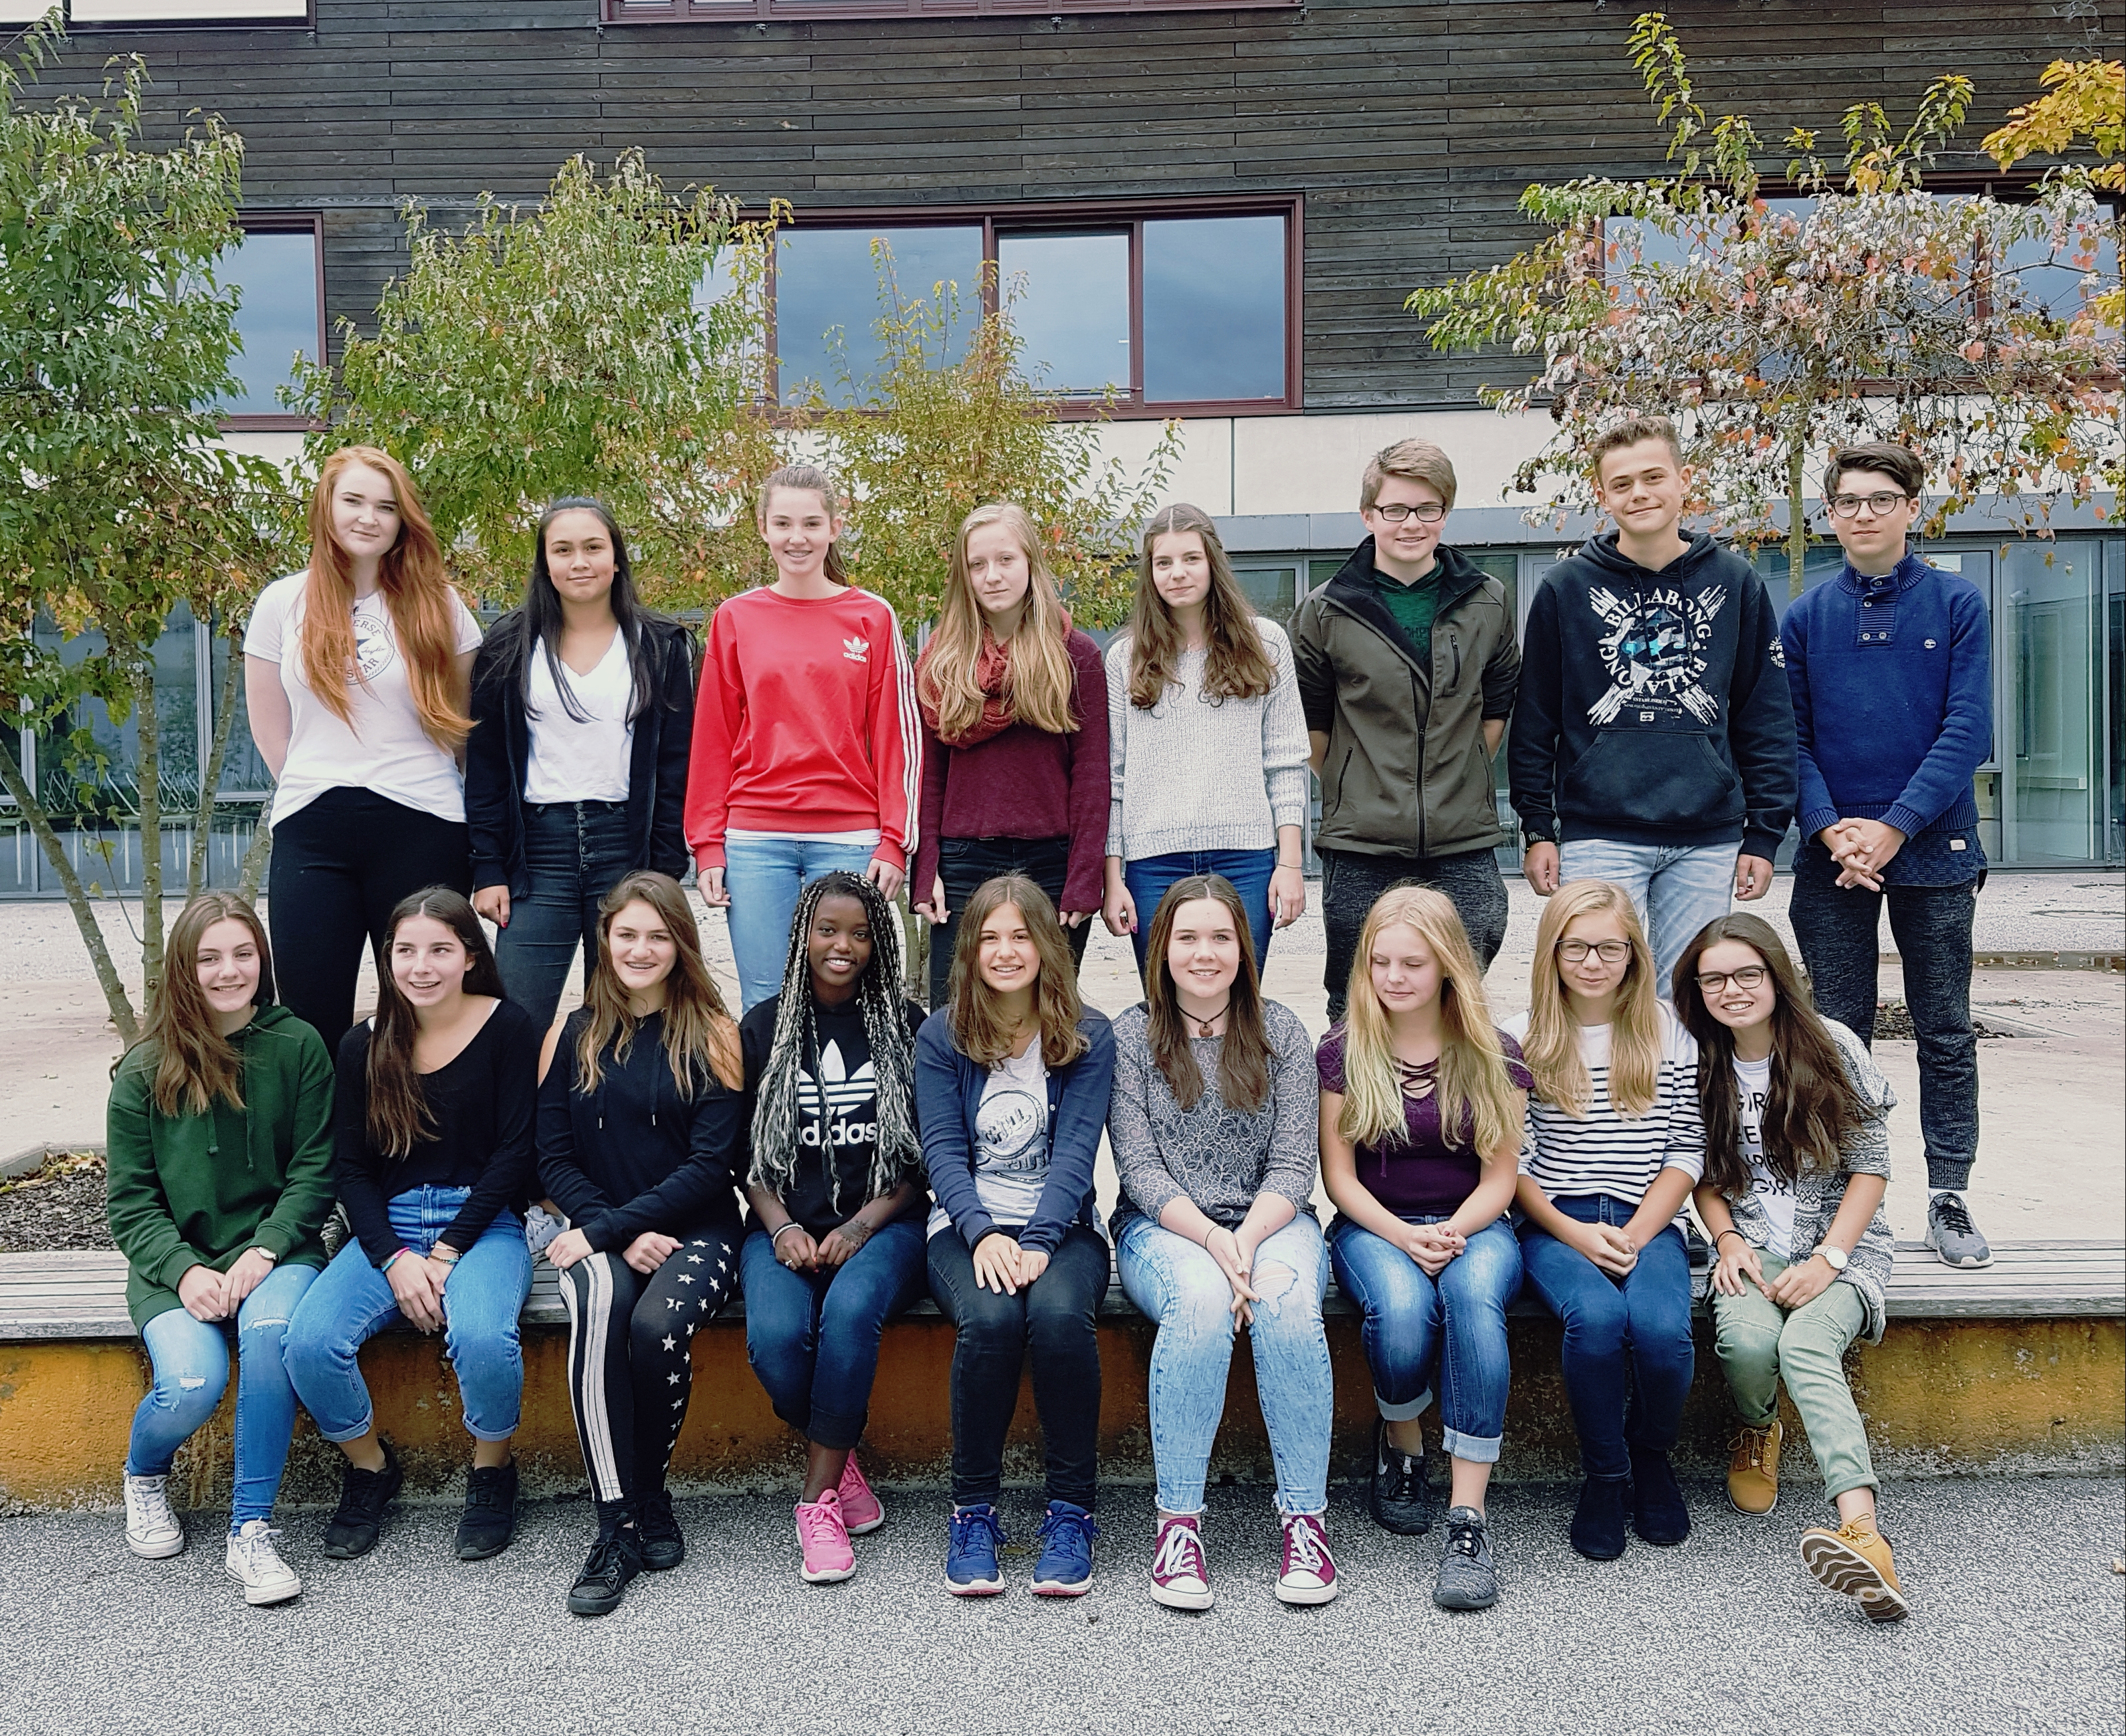 Oberland realschule holzkirchen